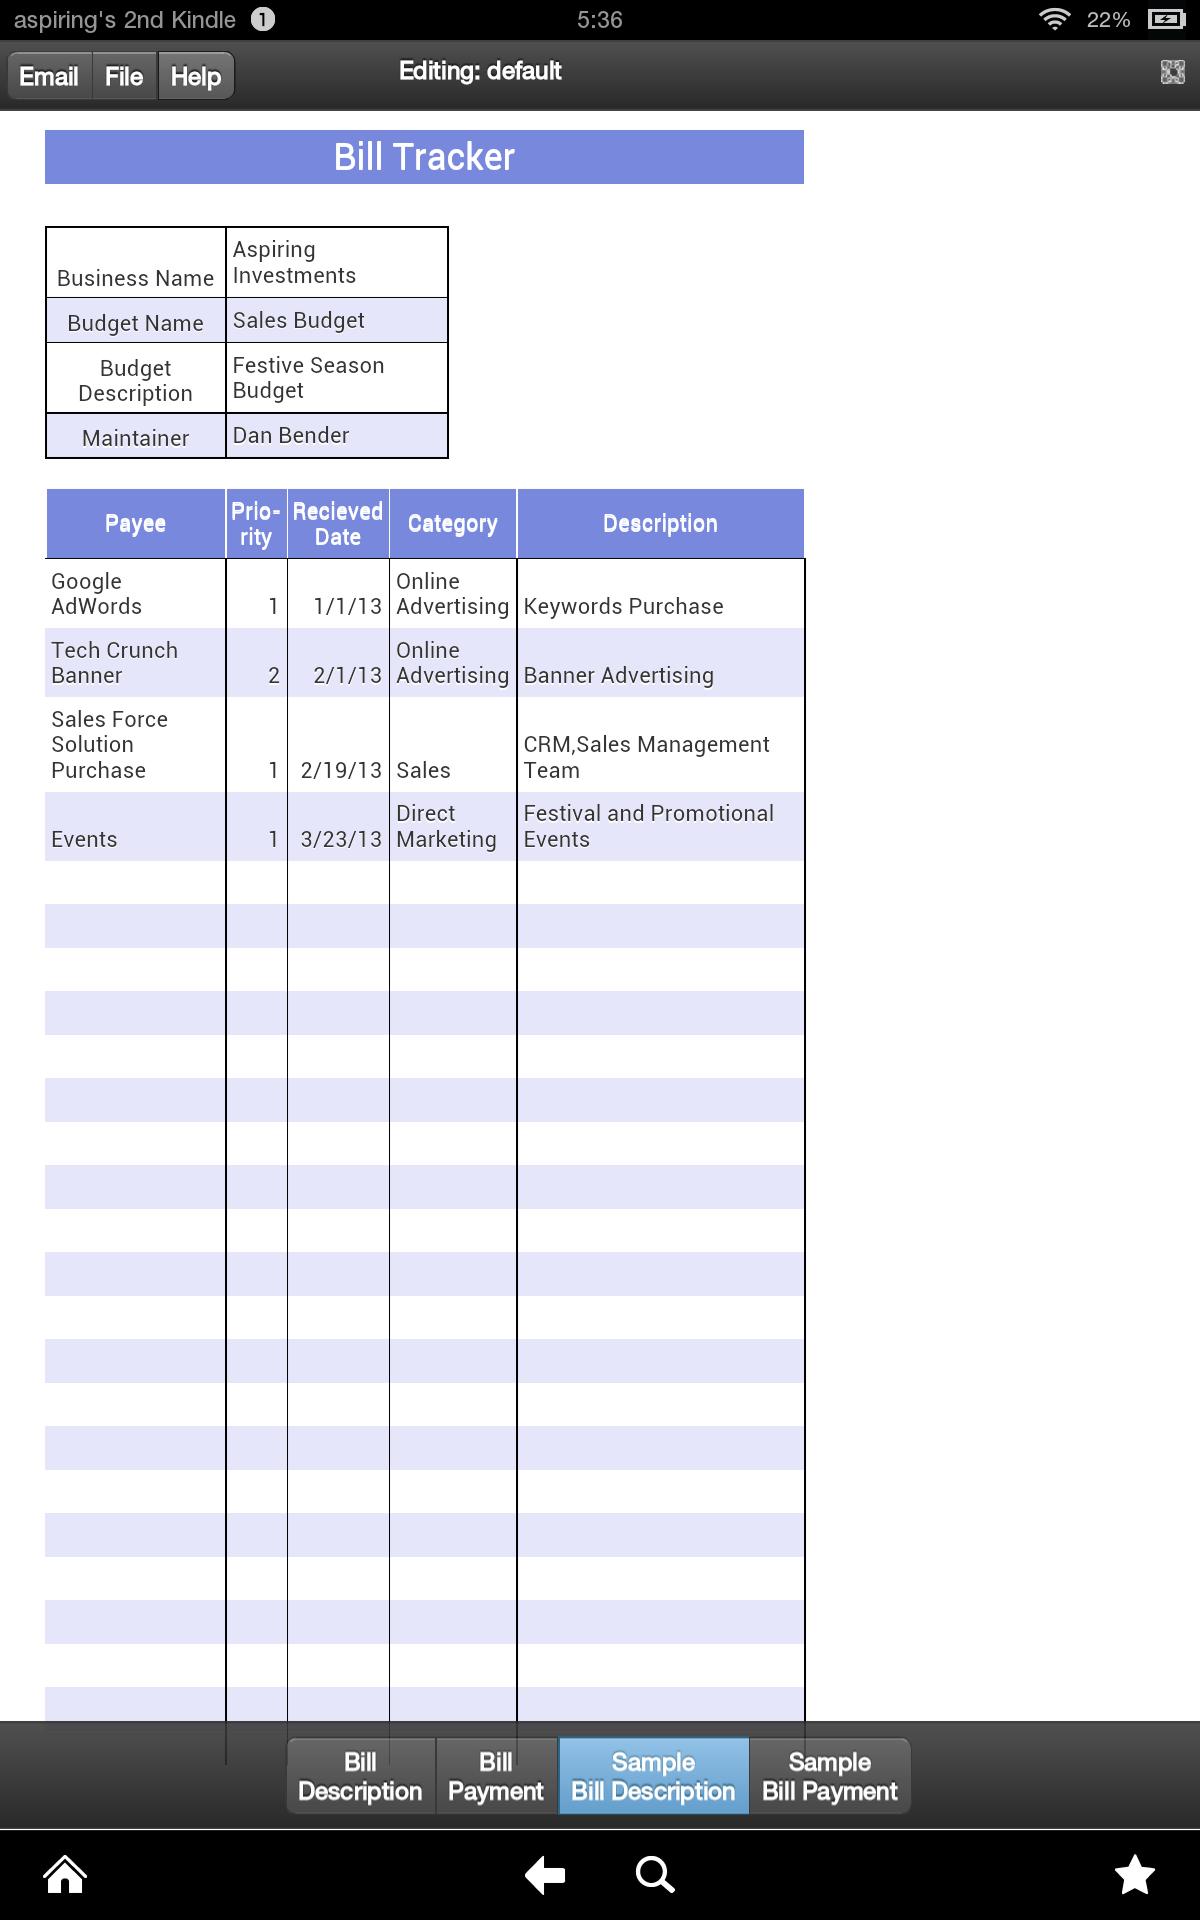 Amazon.com: Bill Tracker (Kindle Tablet Edition): Appstore